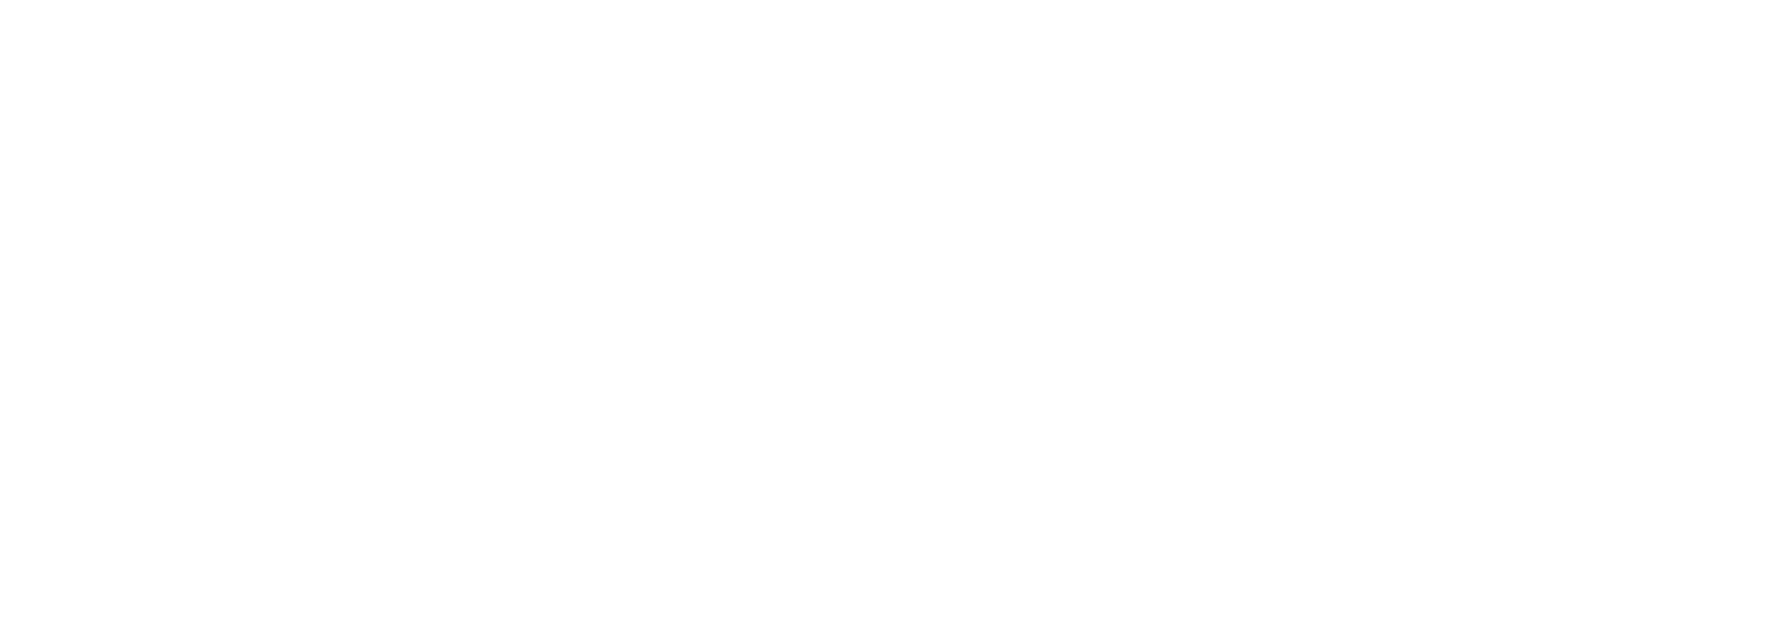 DeLorean Advokat